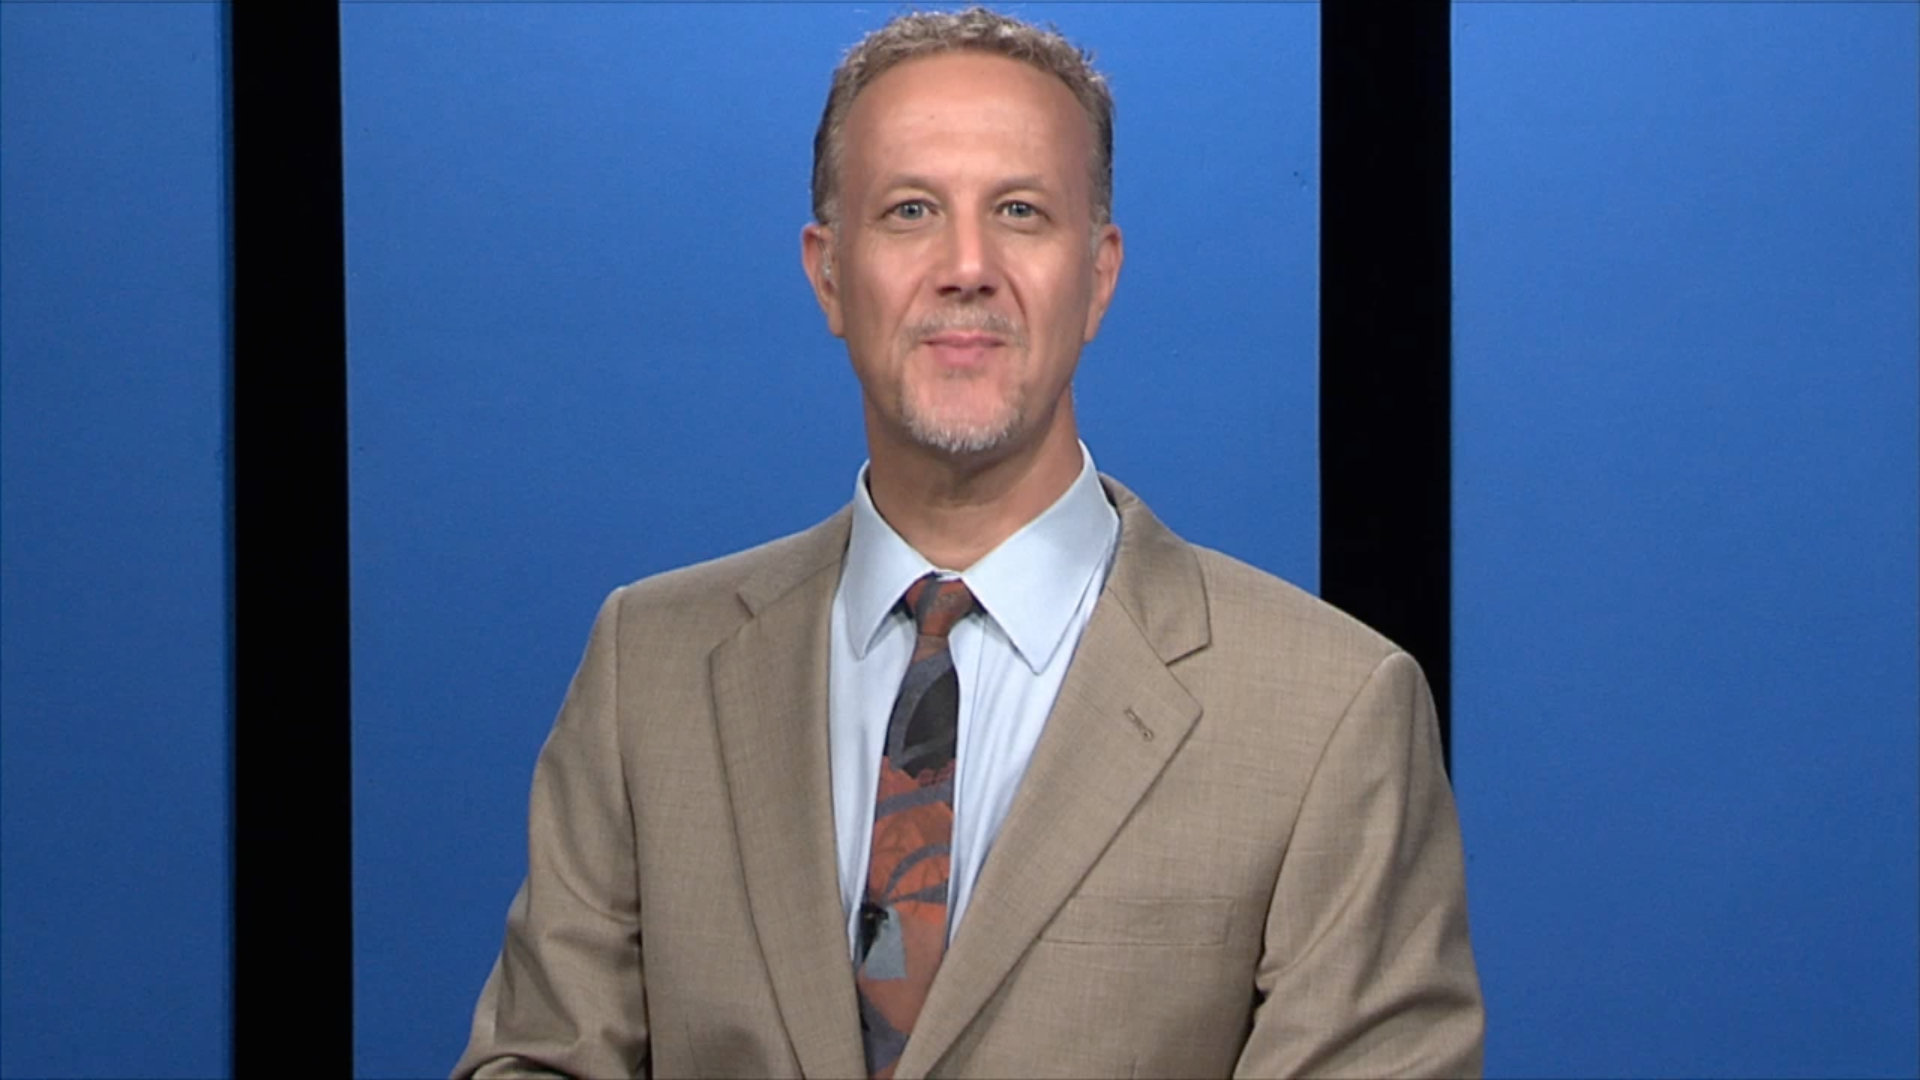 Newscast: July 10, 2013